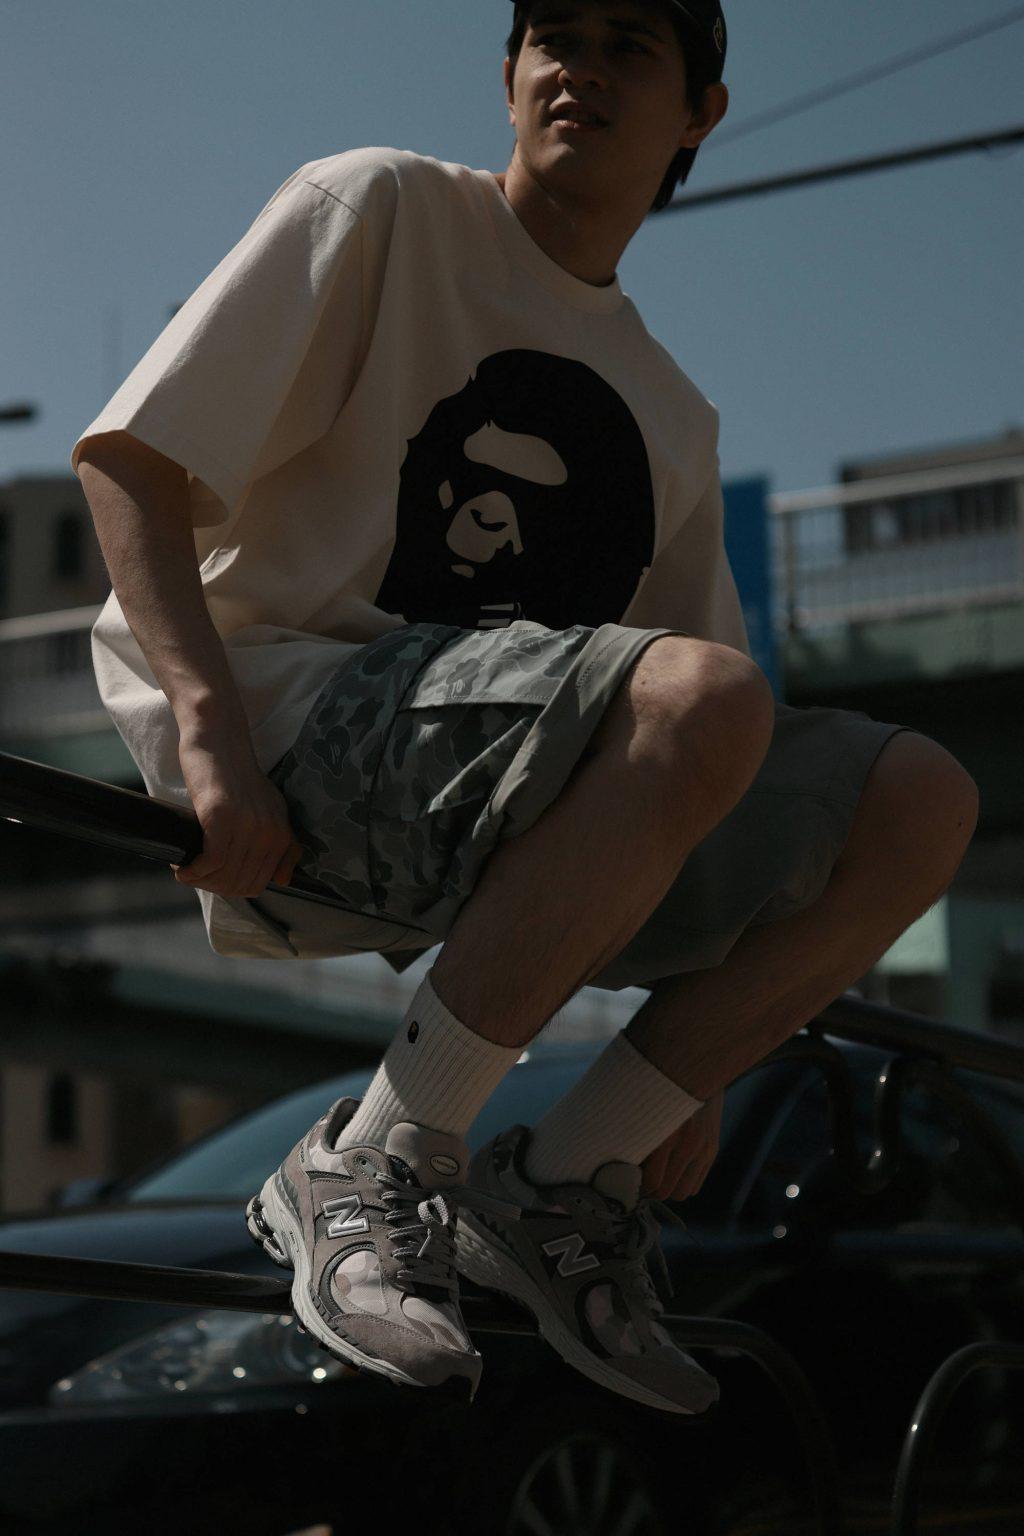 bape-a-bathing-ape-new-balance-2002r-release-2021